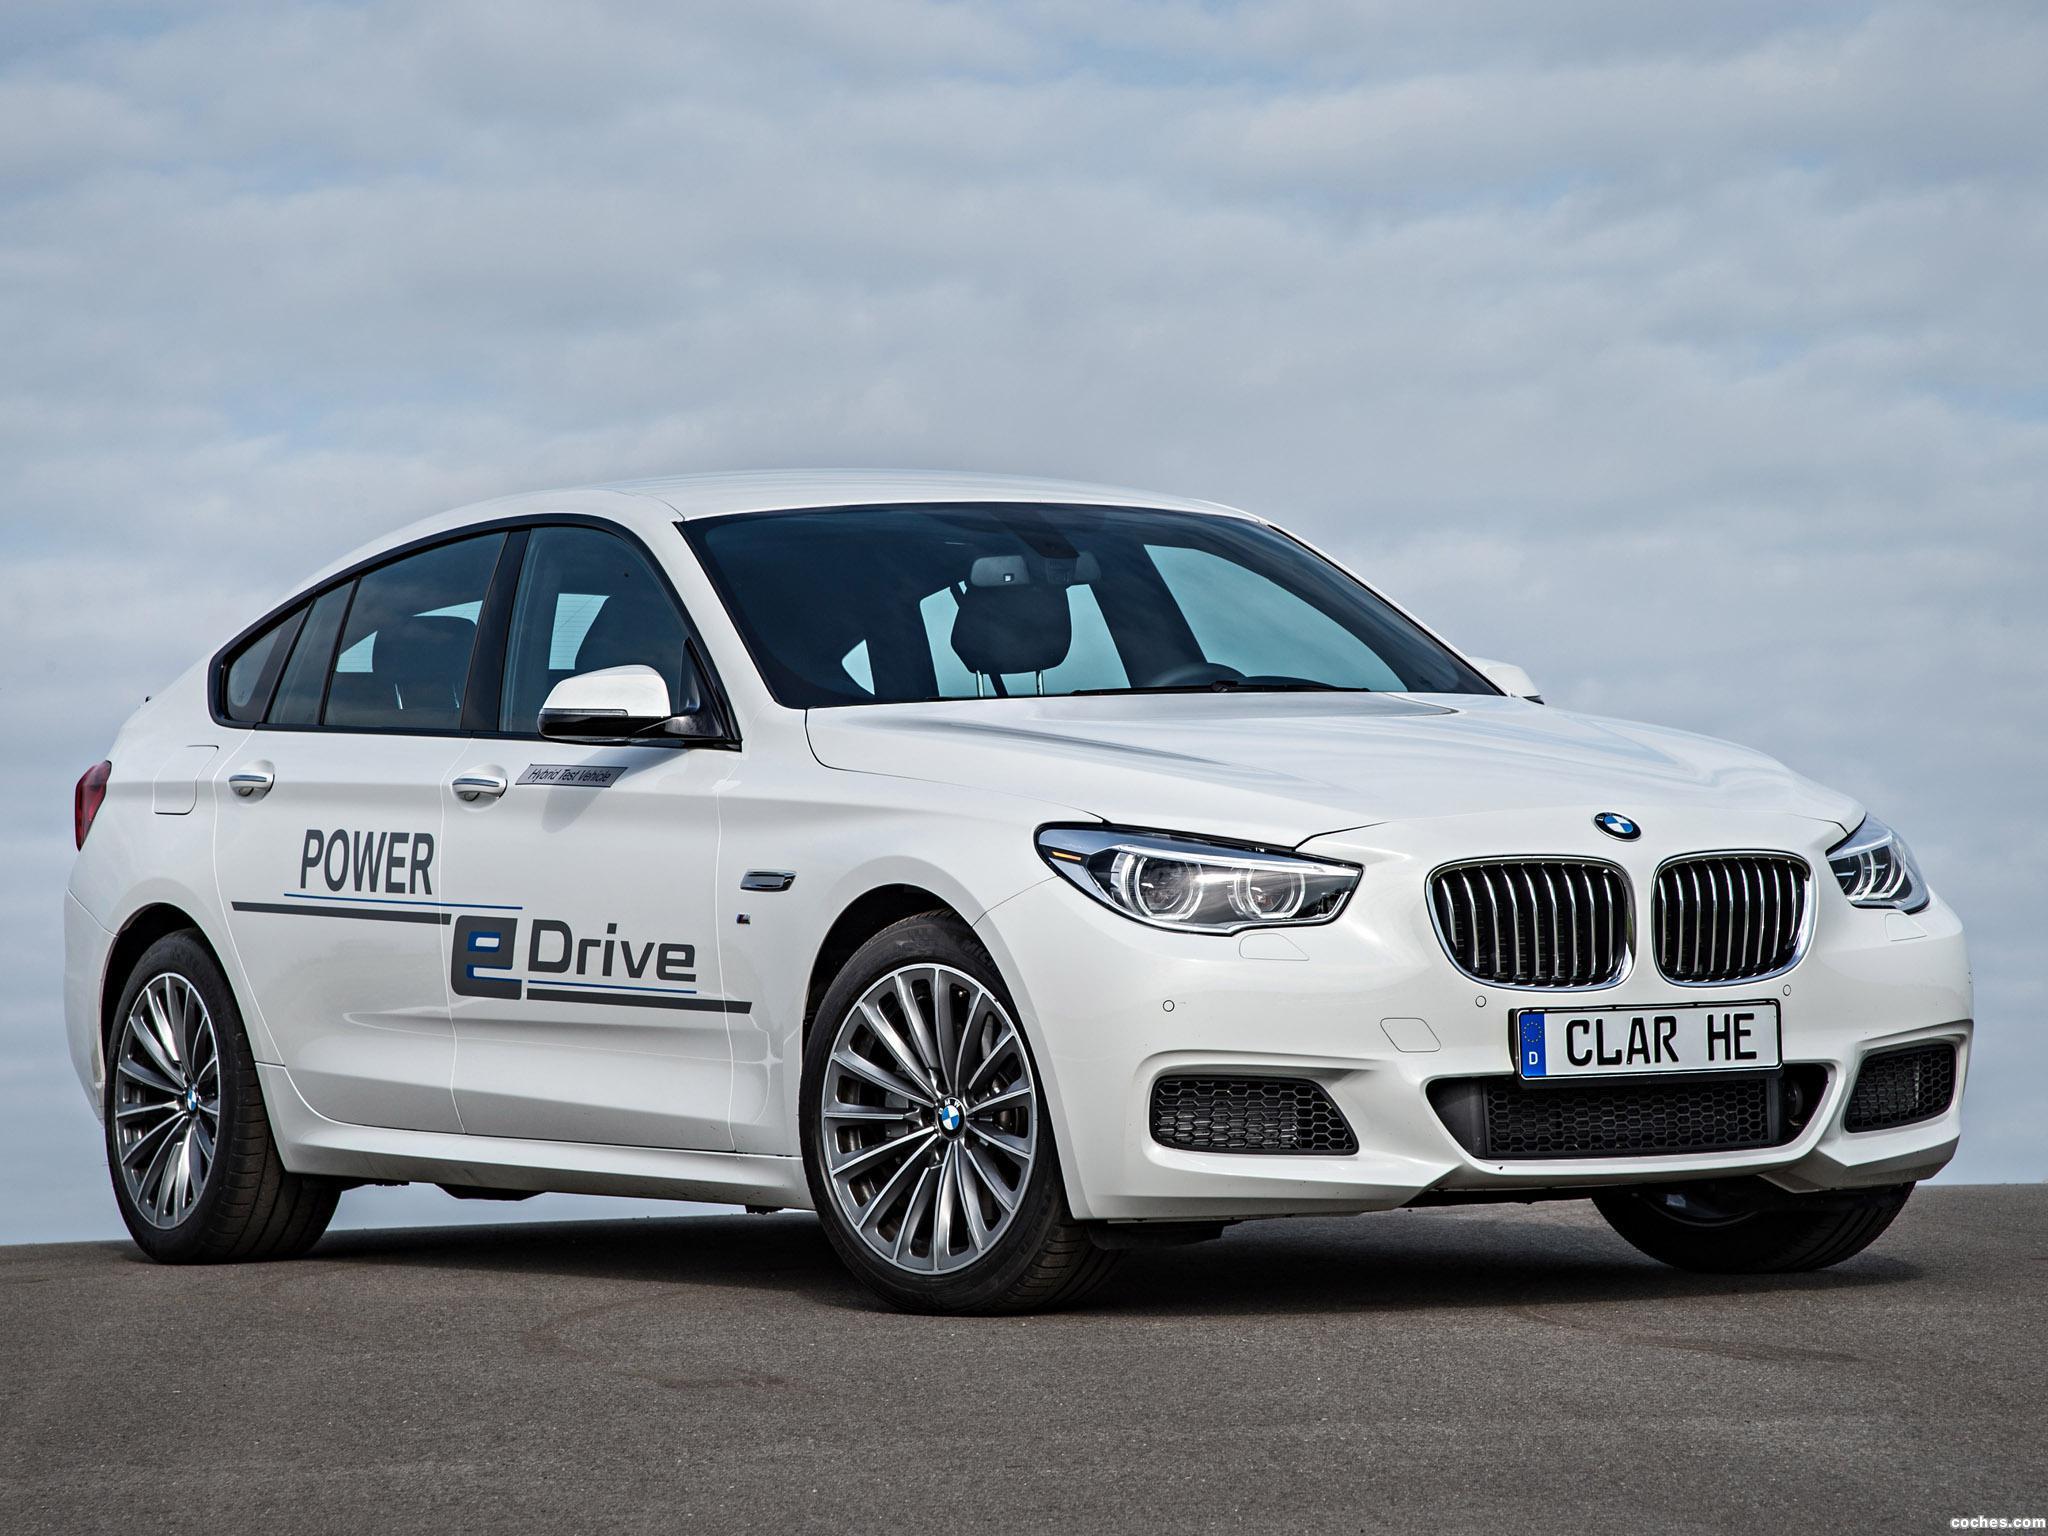 Foto 15 de BMW Serie 5 Gran Turismo Edrive Prototype 2014